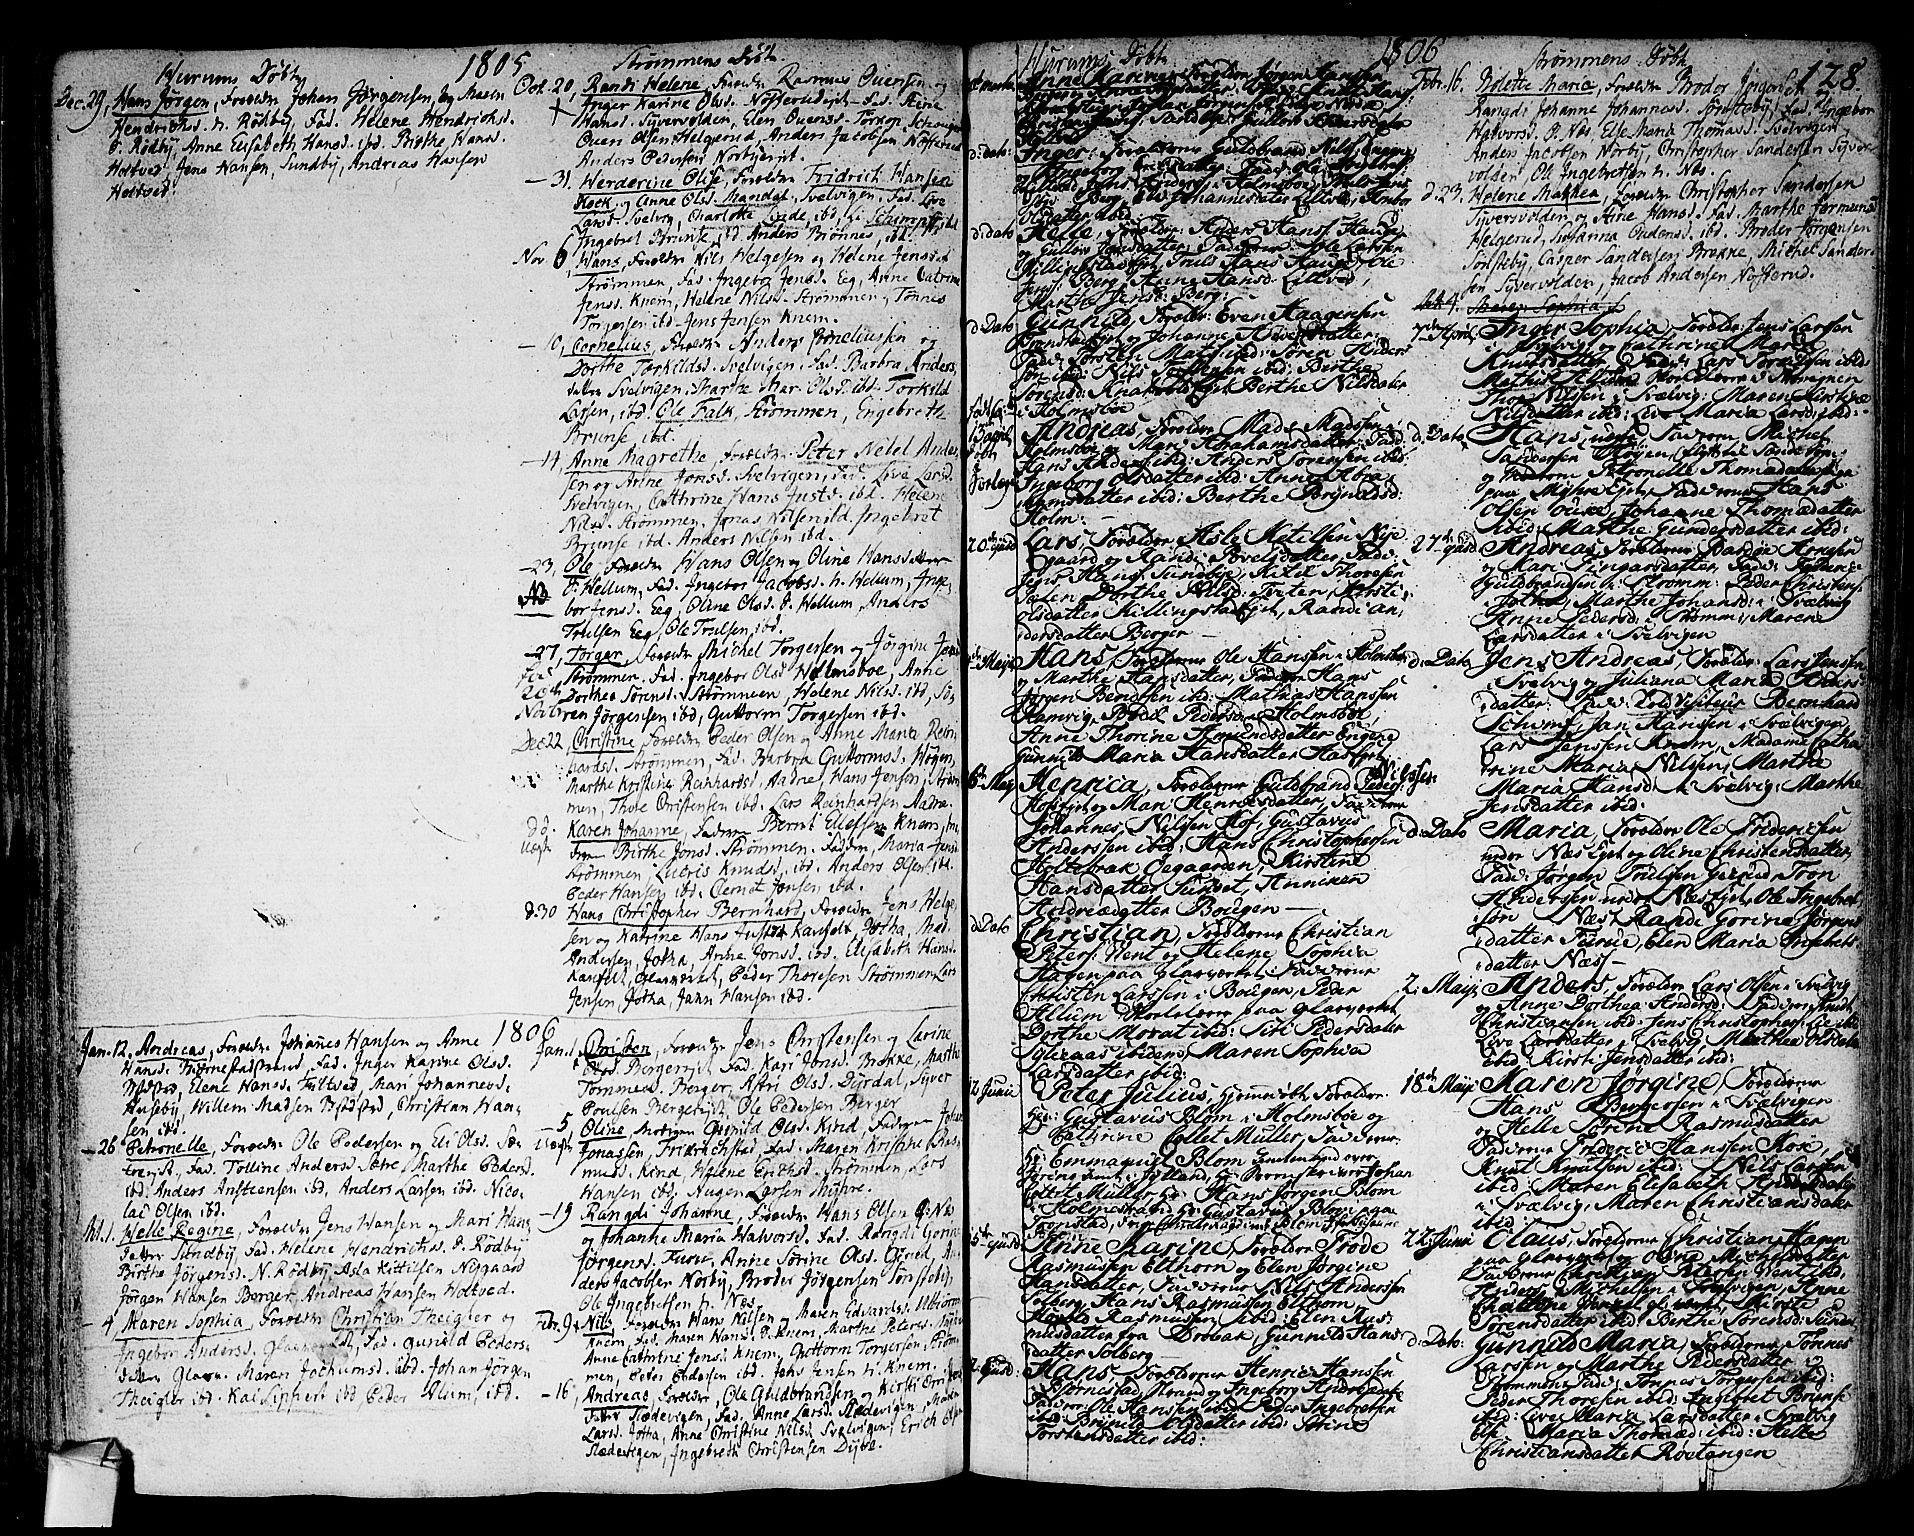 SAKO, Hurum kirkebøker, F/Fa/L0007: Ministerialbok nr. 7, 1771-1810, s. 128